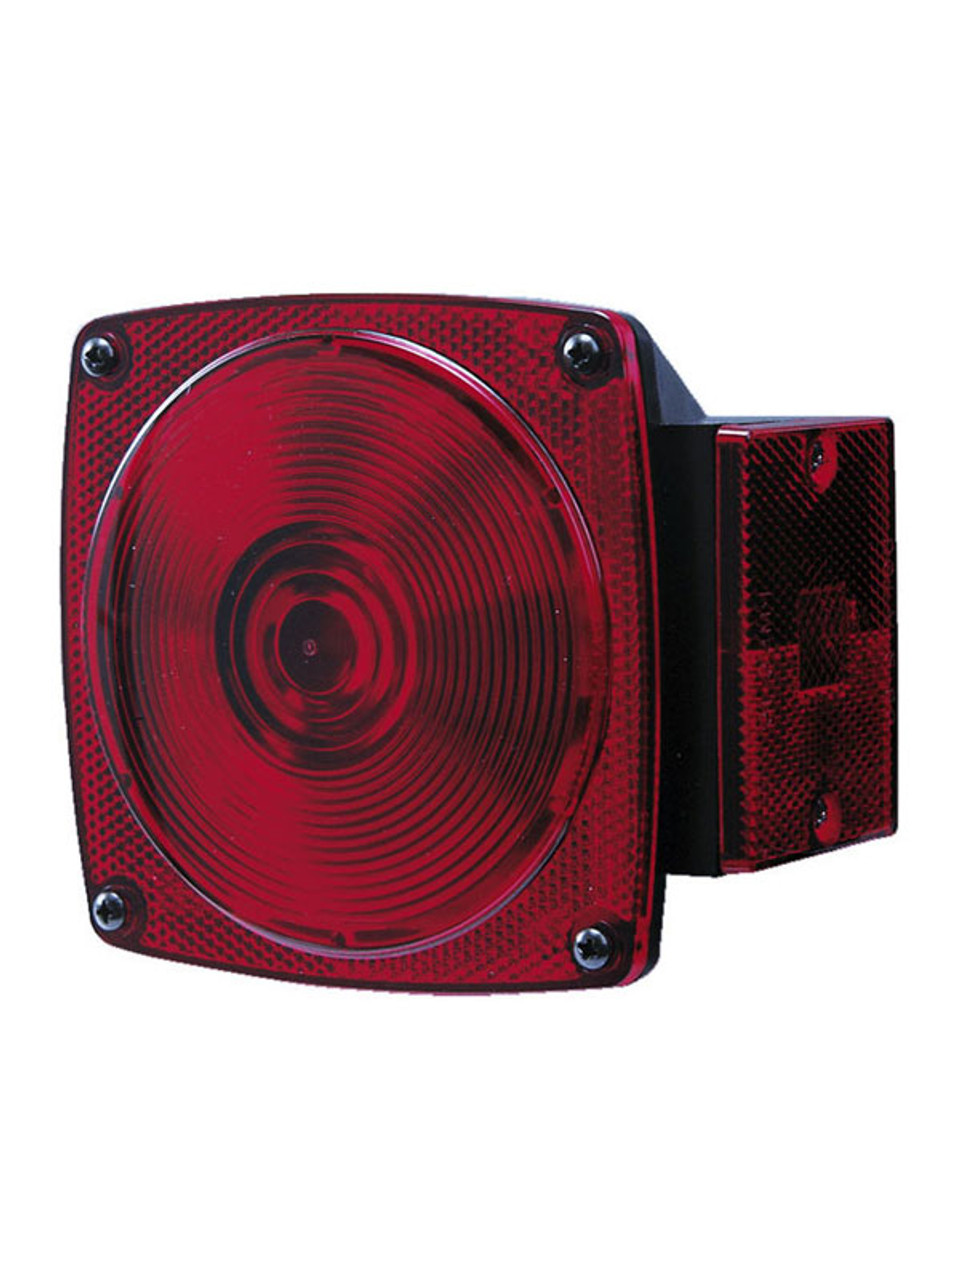 "441L --- Submersible Square Combination Left Tail Light, License Illuminator, Side Marker - For Under 80"" Wide Trailer"